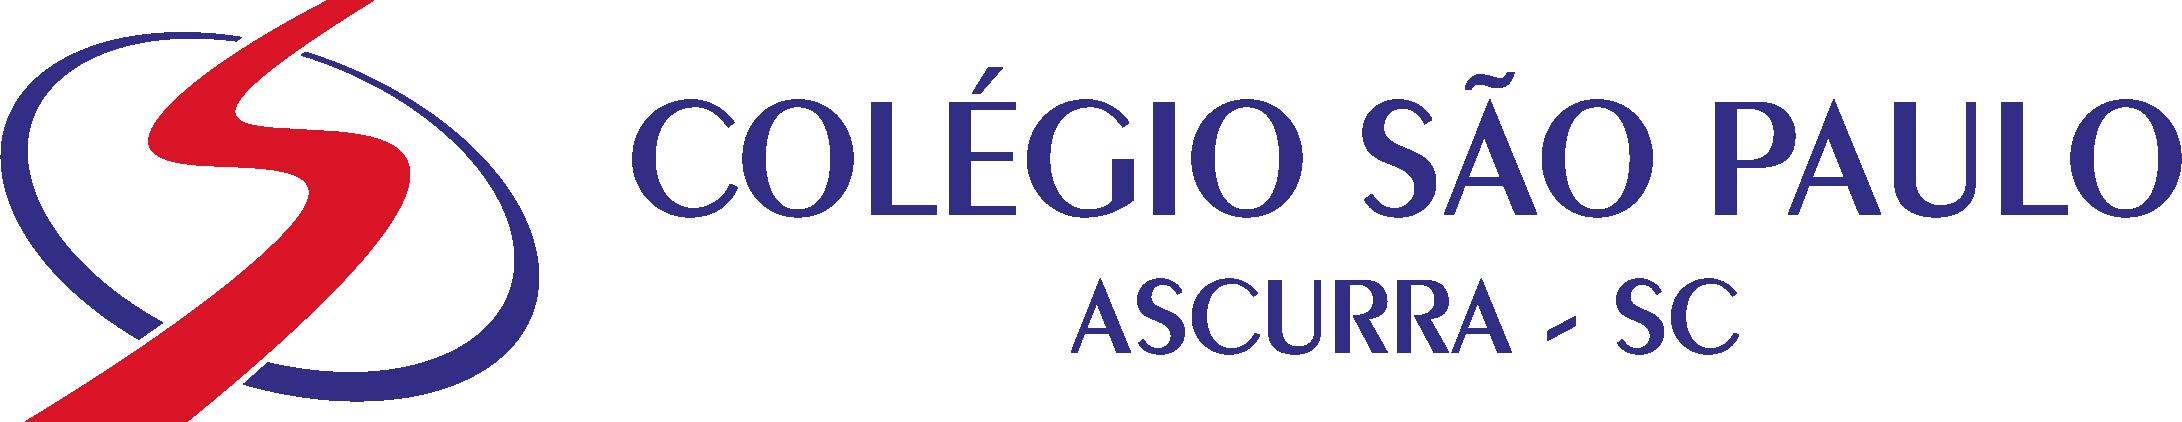 Logo_colsaopaulo_ascurra